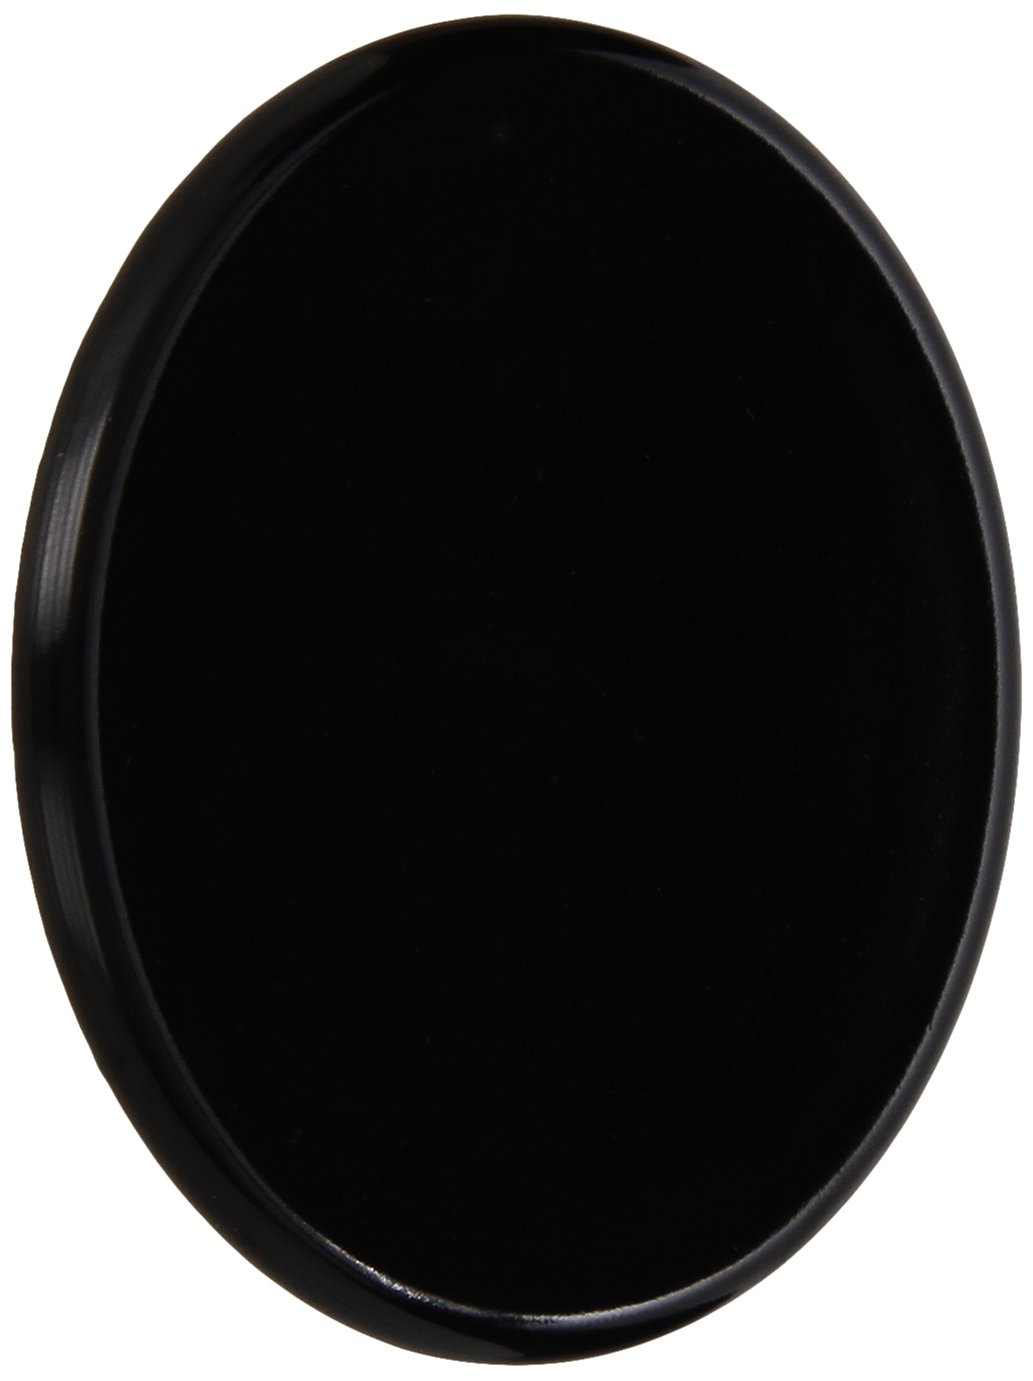 Frigidaire 316261900 Range/Stove/Oven Surface Burner Cap